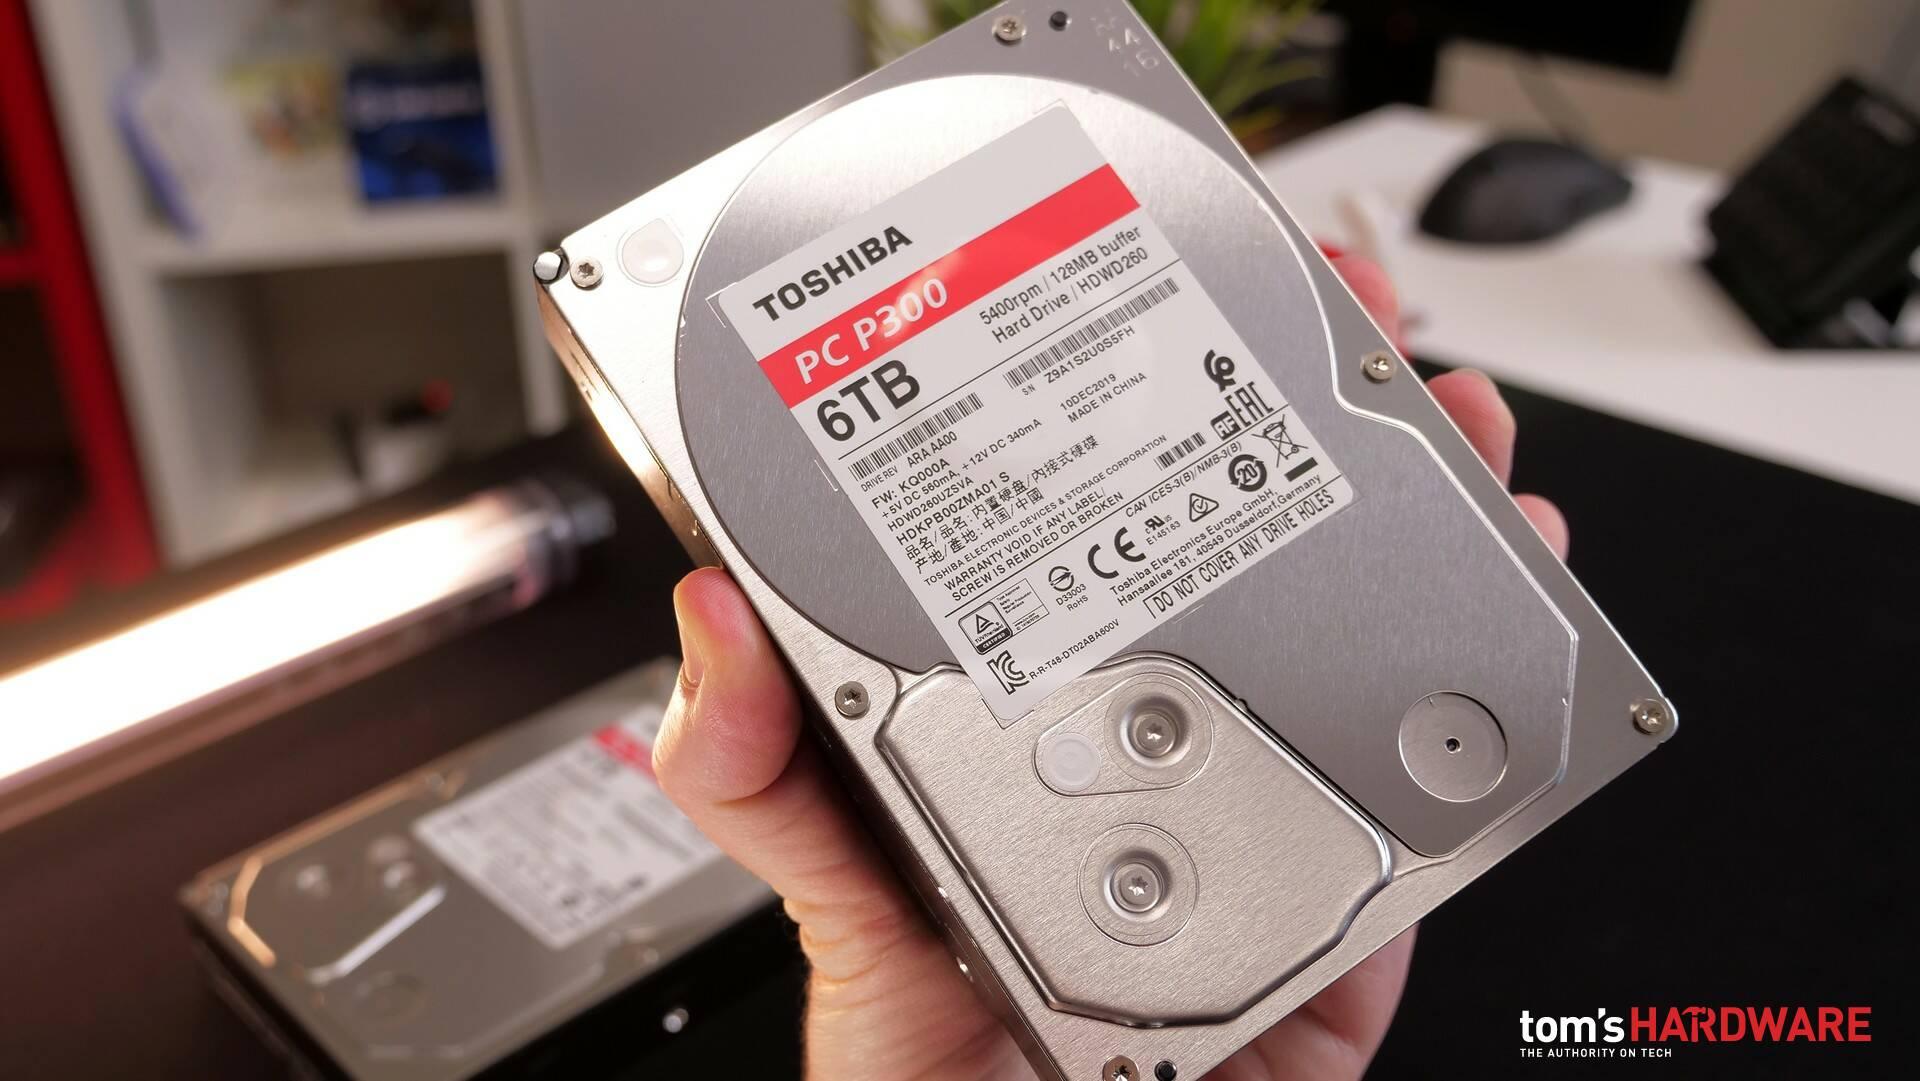 Toshiba PC P300 Hard Disk